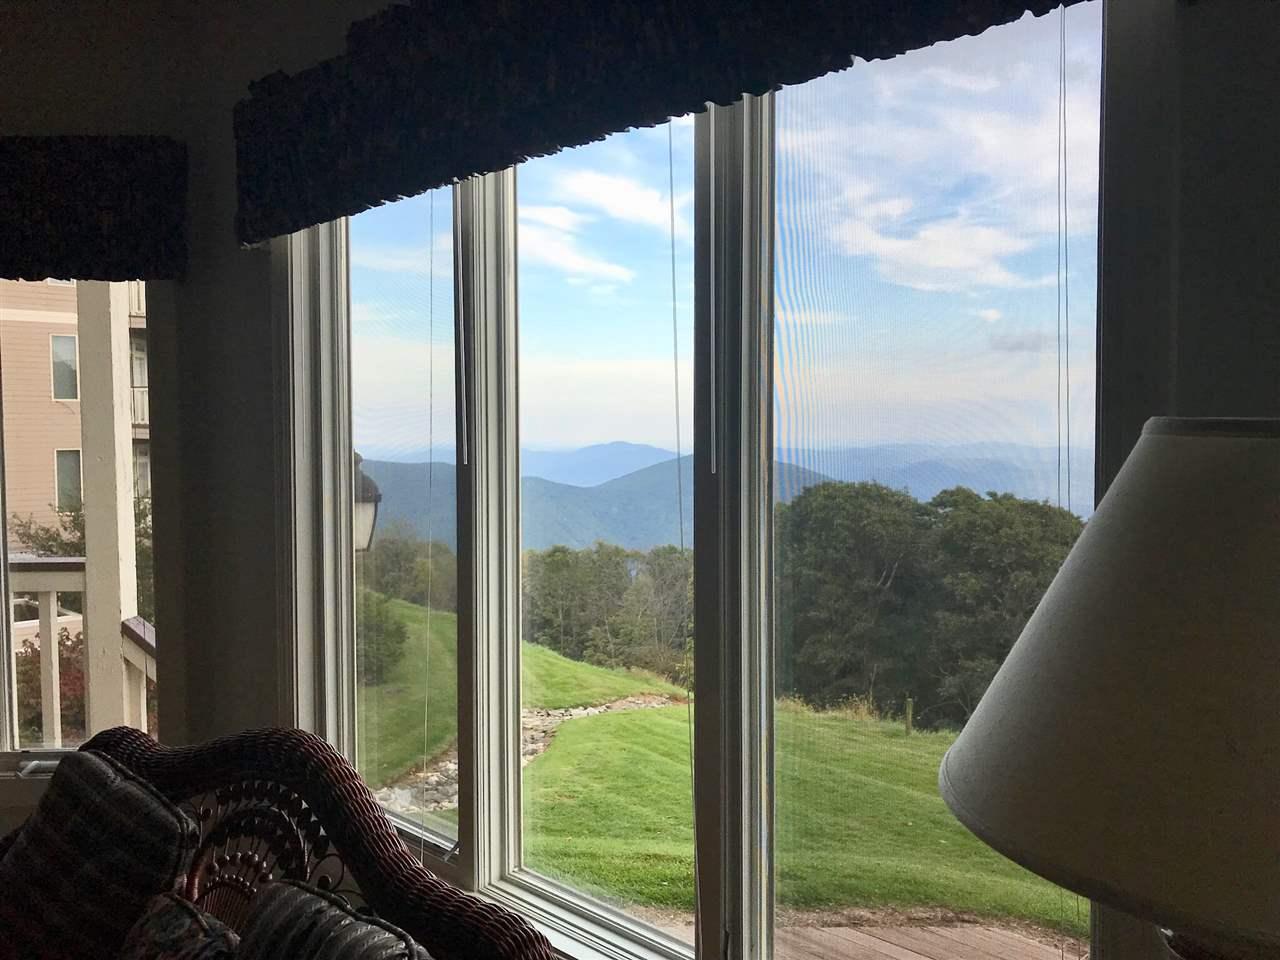 1812 High Ridge Ct Condos, Wintergreen Resort, VA, 22967